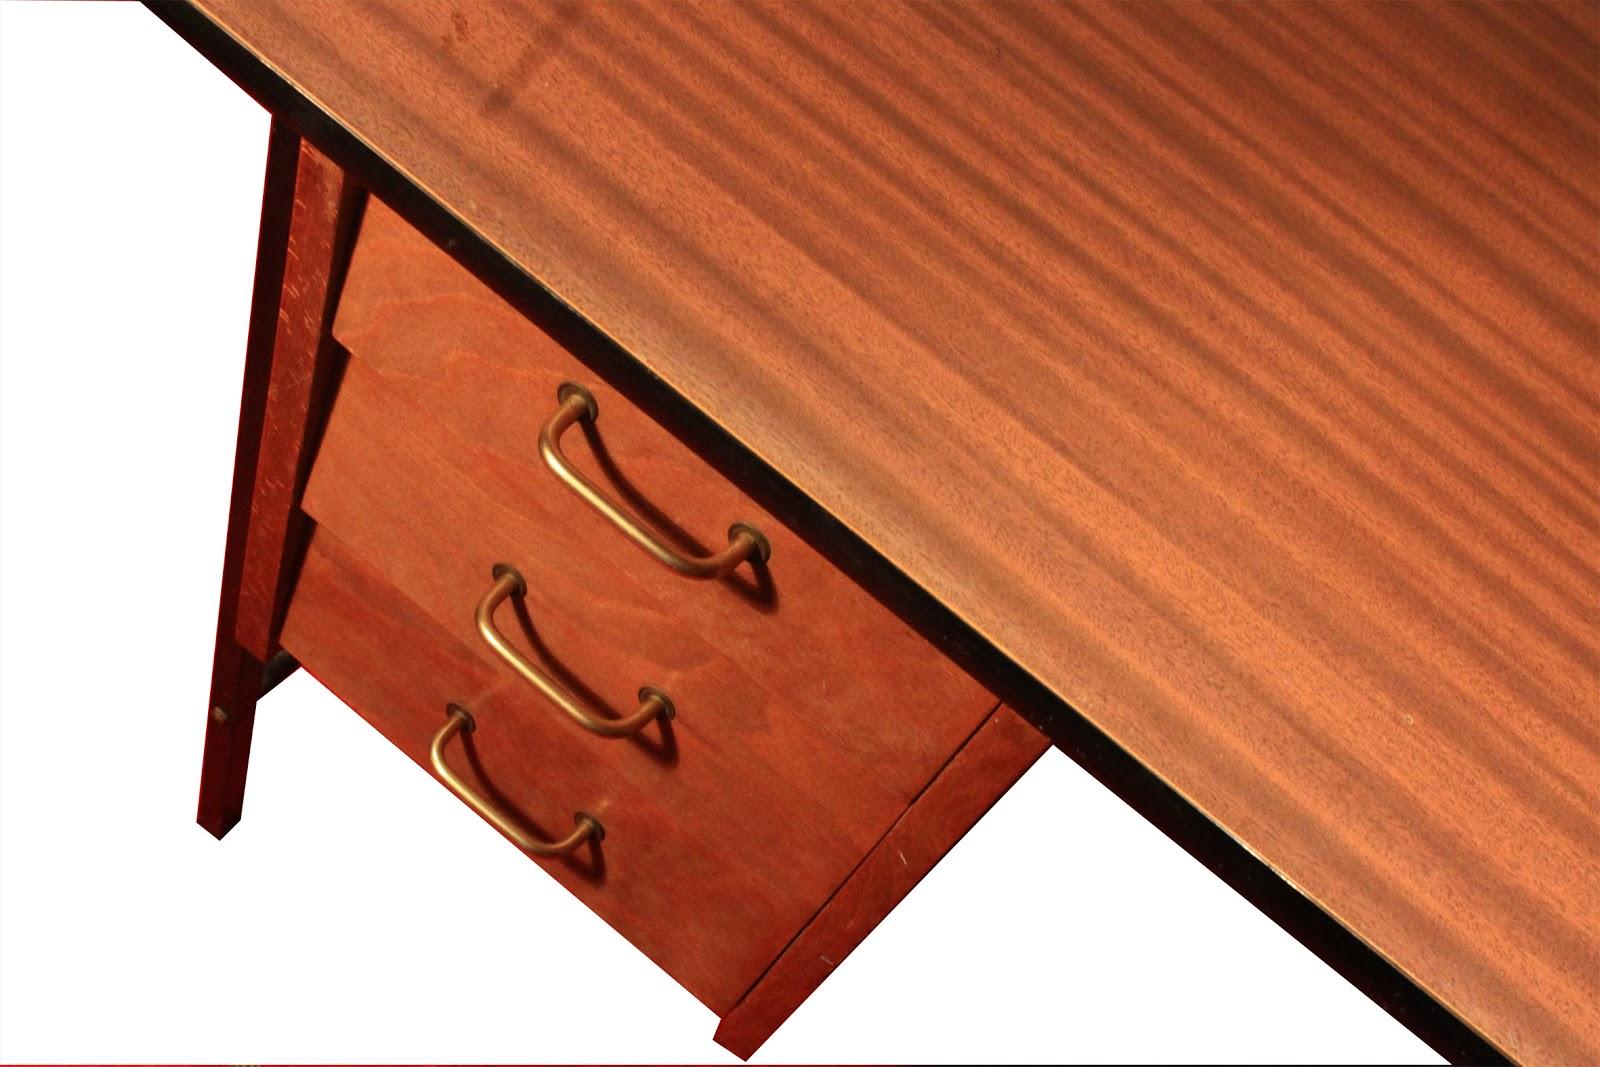 chicbaazar objets vintage 50 60 70 bureau guariche paulin design moderniste. Black Bedroom Furniture Sets. Home Design Ideas